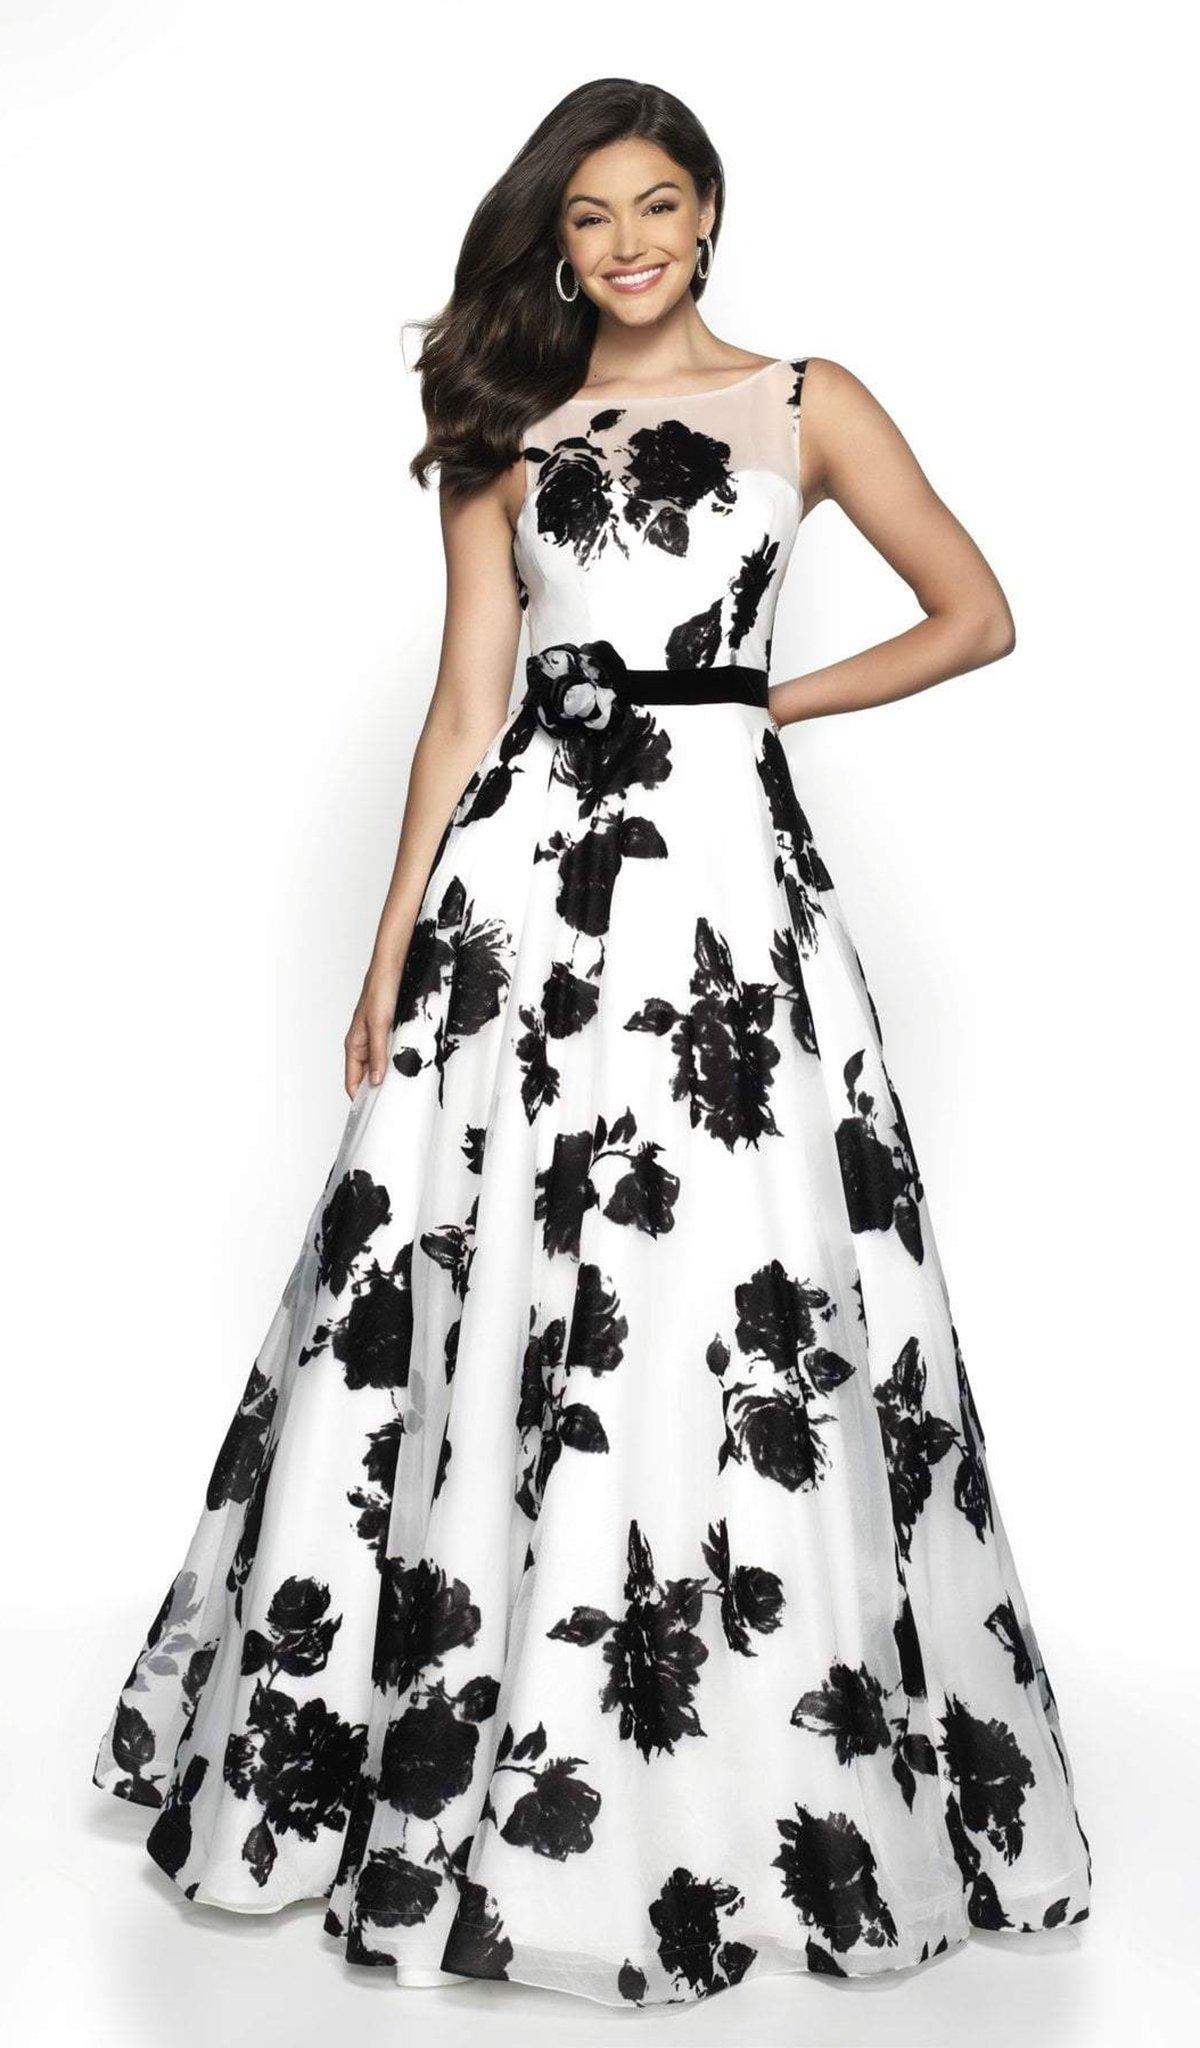 Blush by Alexia Designs - 5722 Illusion Bateau Floral Dress